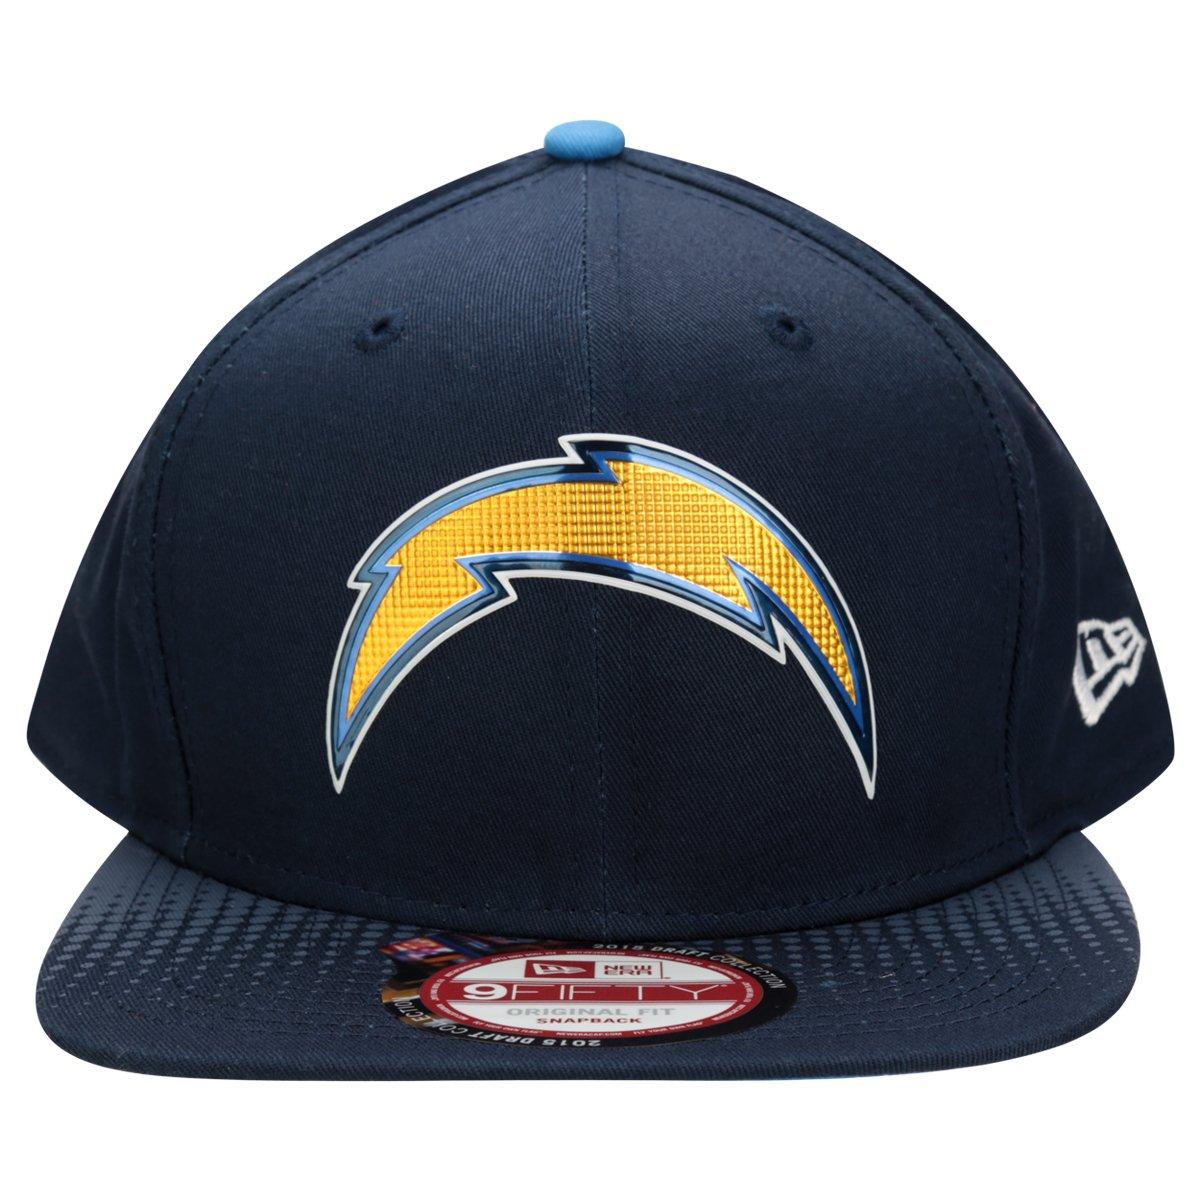 San Diego Chargers Draft: Boné New Era NFL 950 Official Draft San Diego Chargers